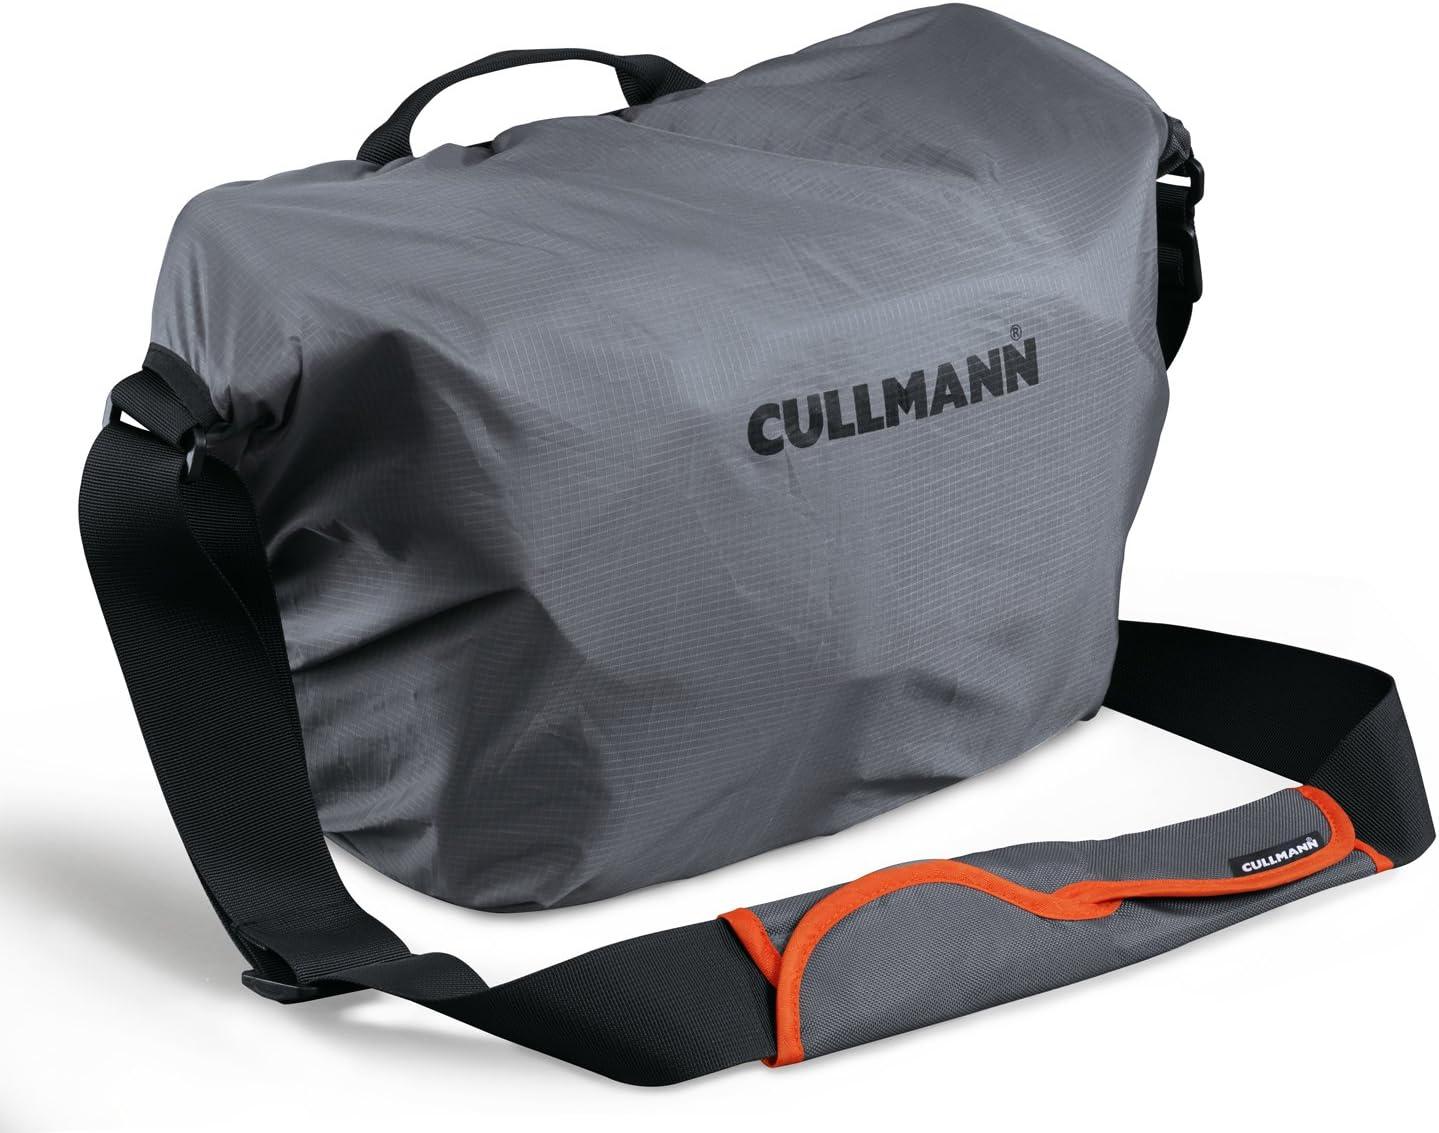 Cullmann Madrid Maxima 325 Sports Grau Kamera